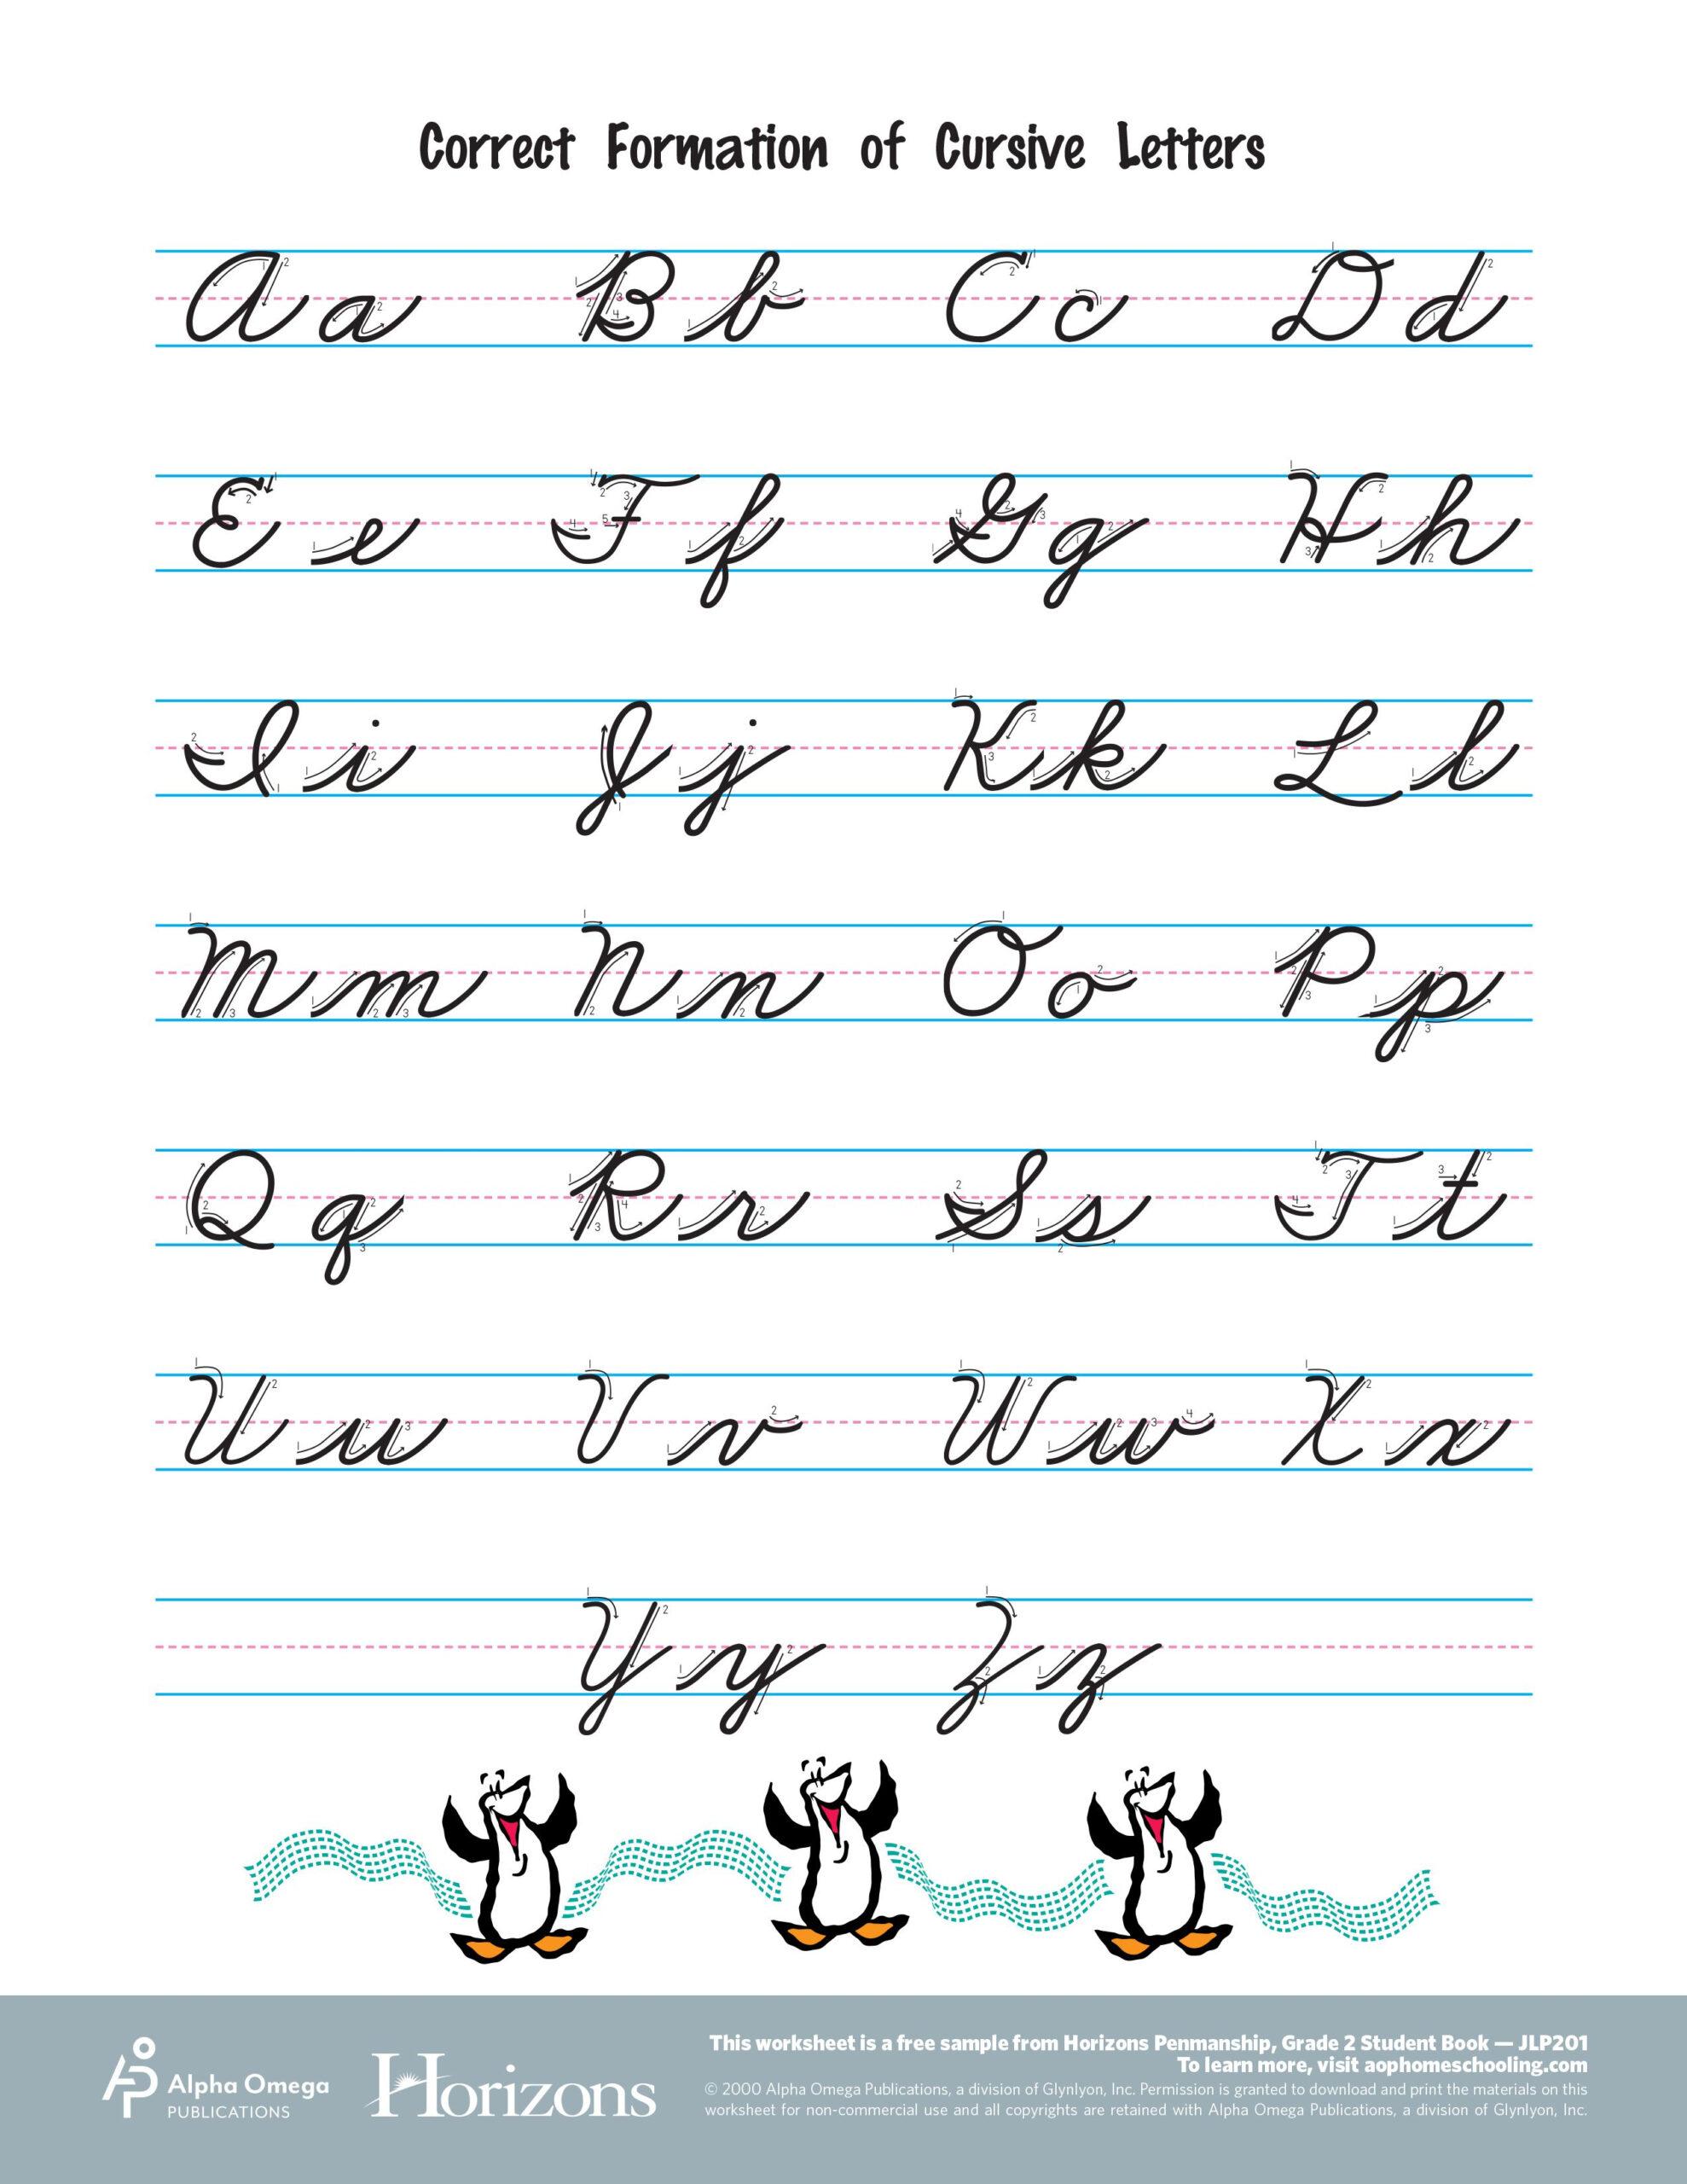 Interactive Cursive Letter Formation